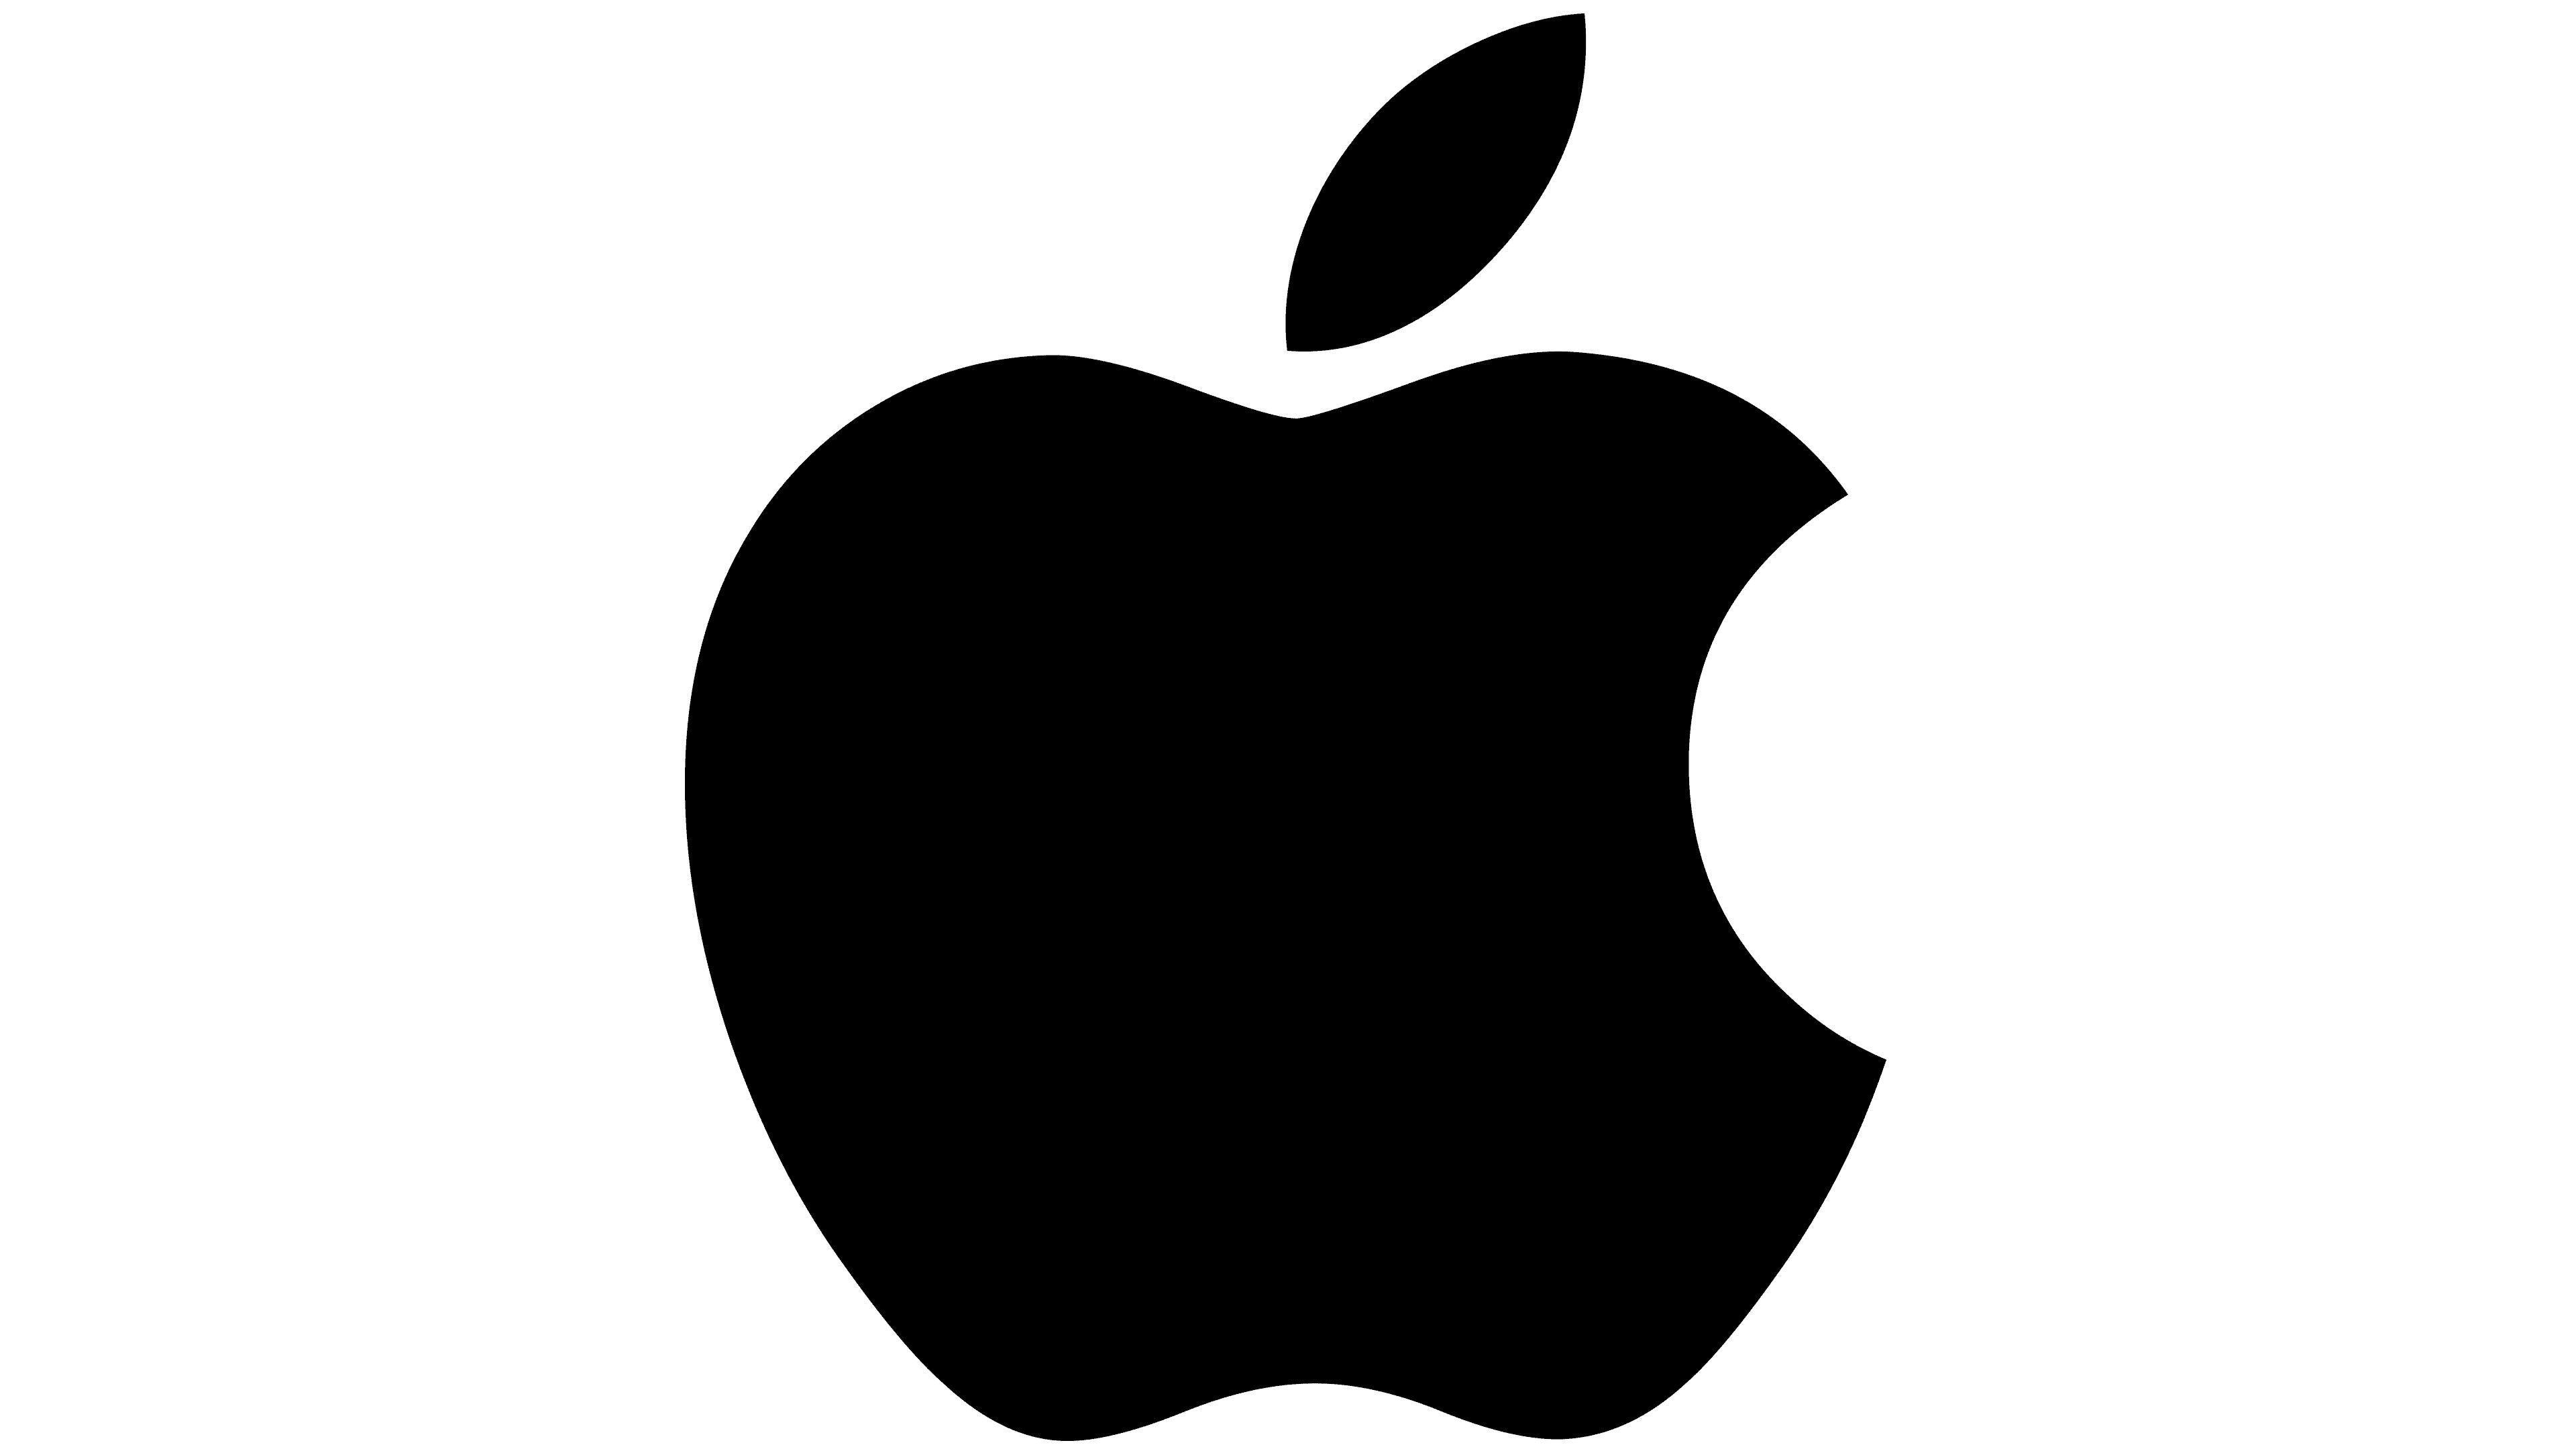 Apple logo Logo